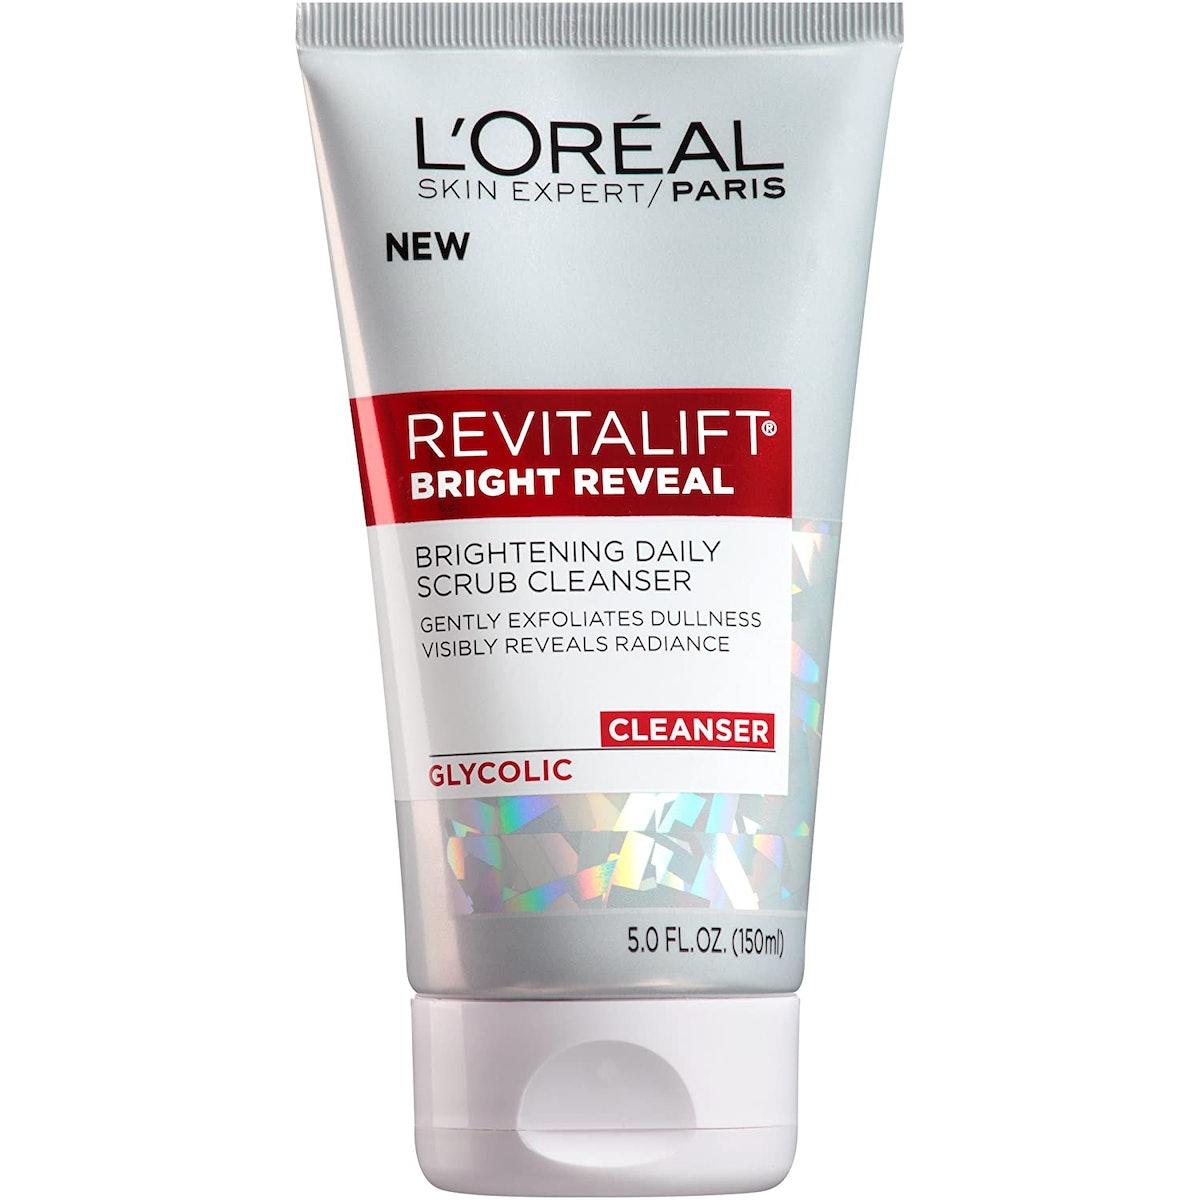 L'Oreal Paris Revitalift Bright Reveal Brightening Daily Scrub Cleanser